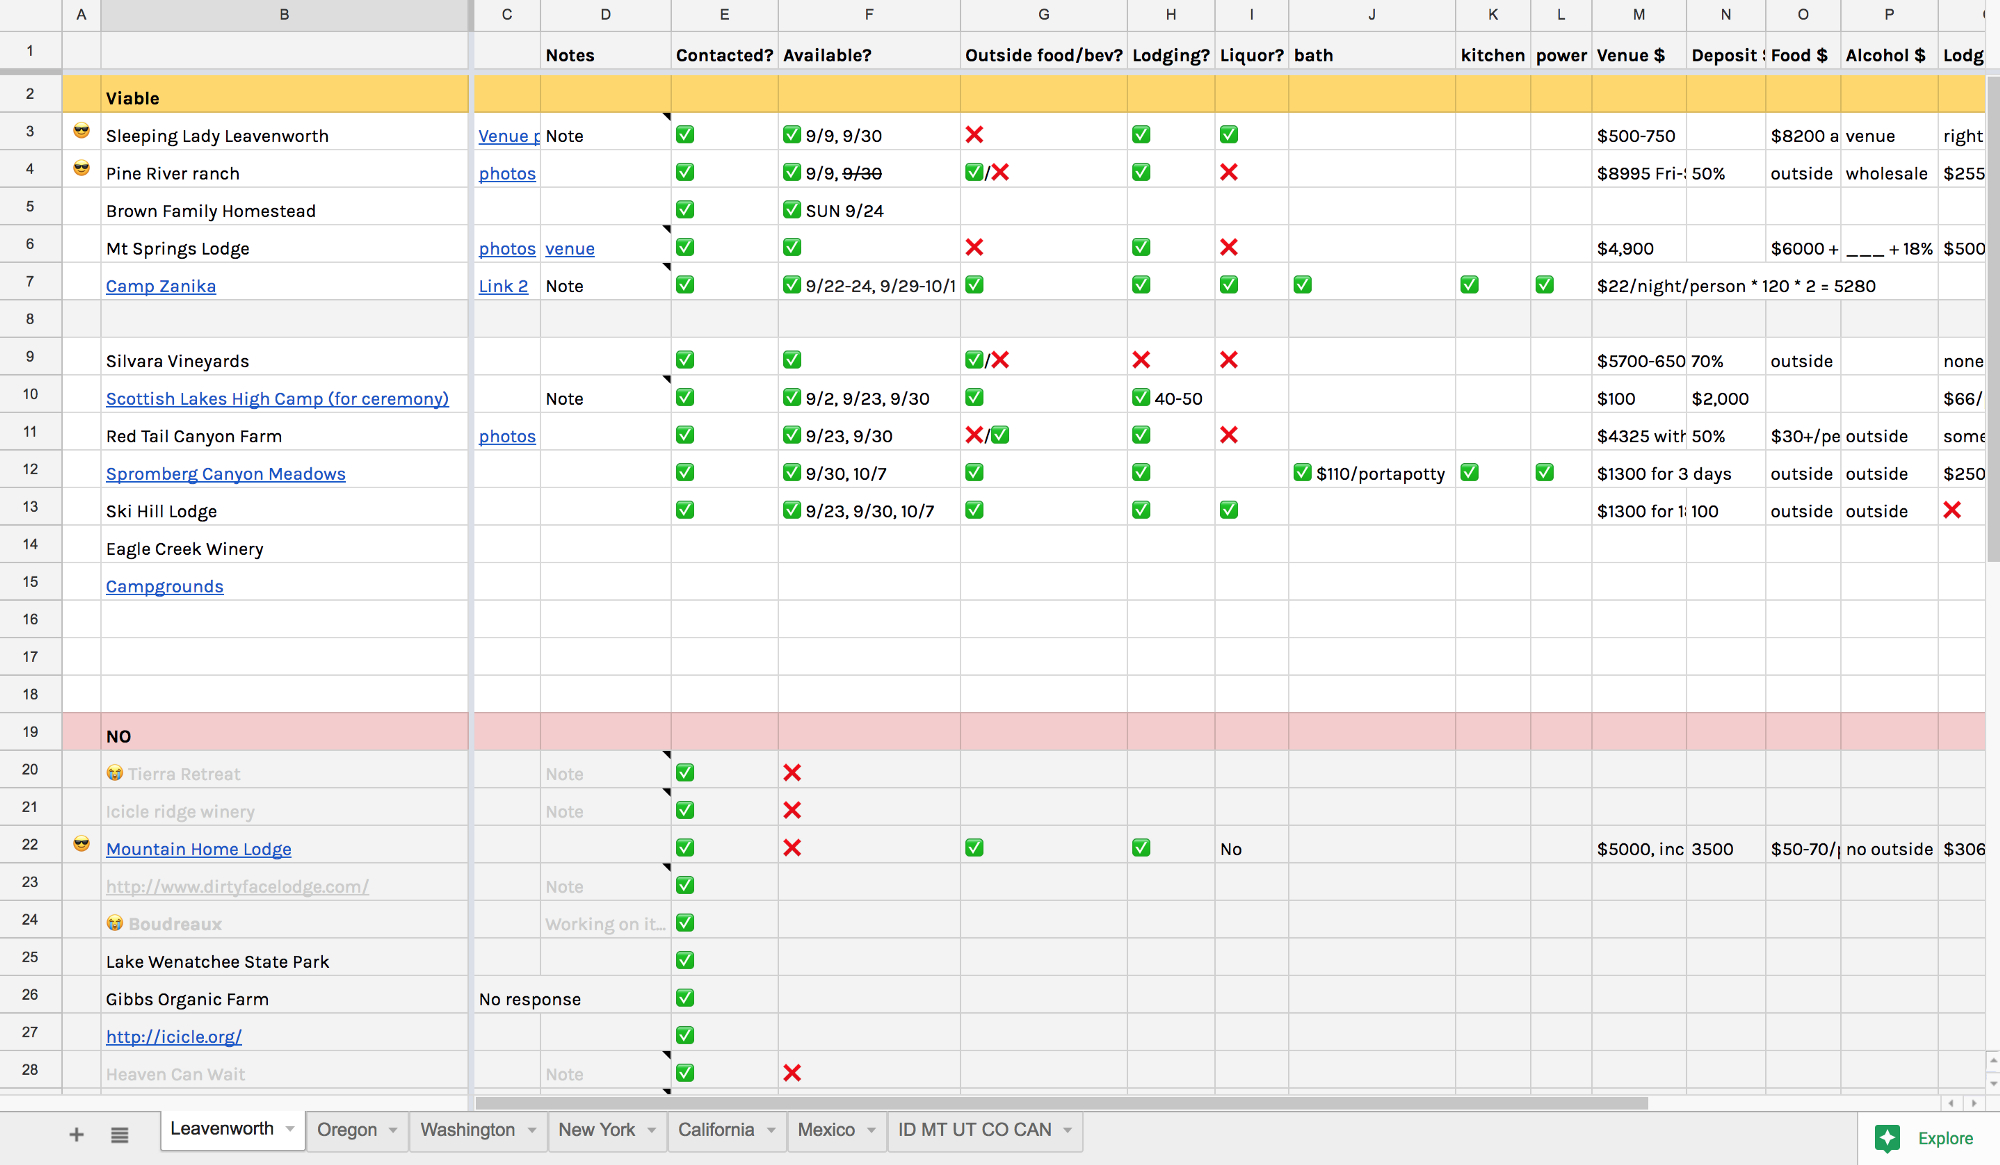 Wedding Planning Spreadsheet Free With Every Spreadsheet You Need To Plan Your Custom Wedding